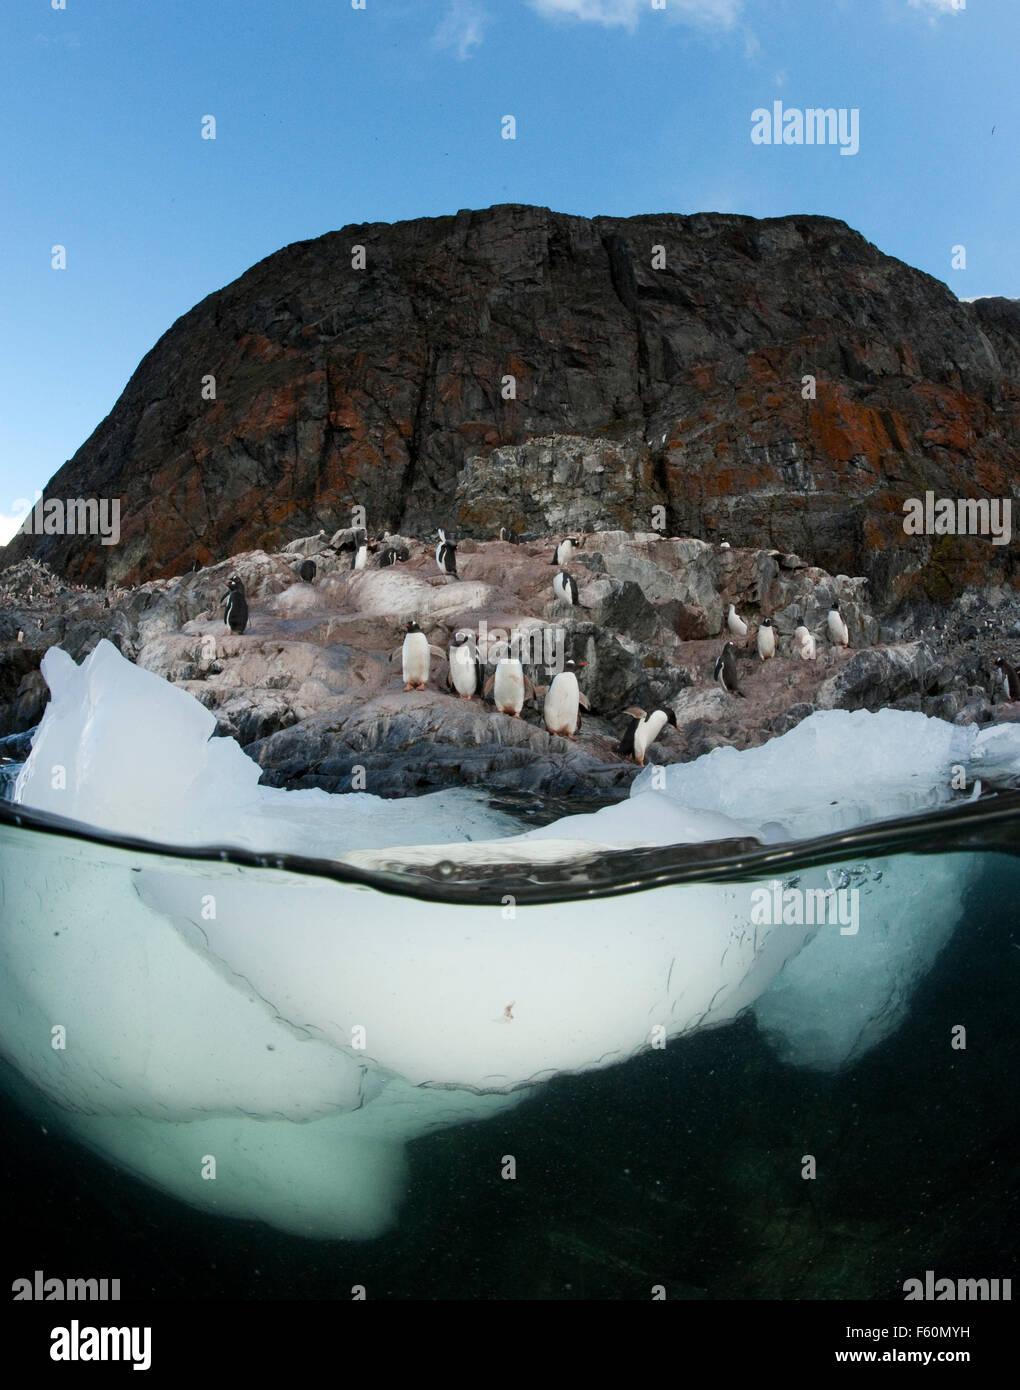 Gentoo Penguin - Stock Image